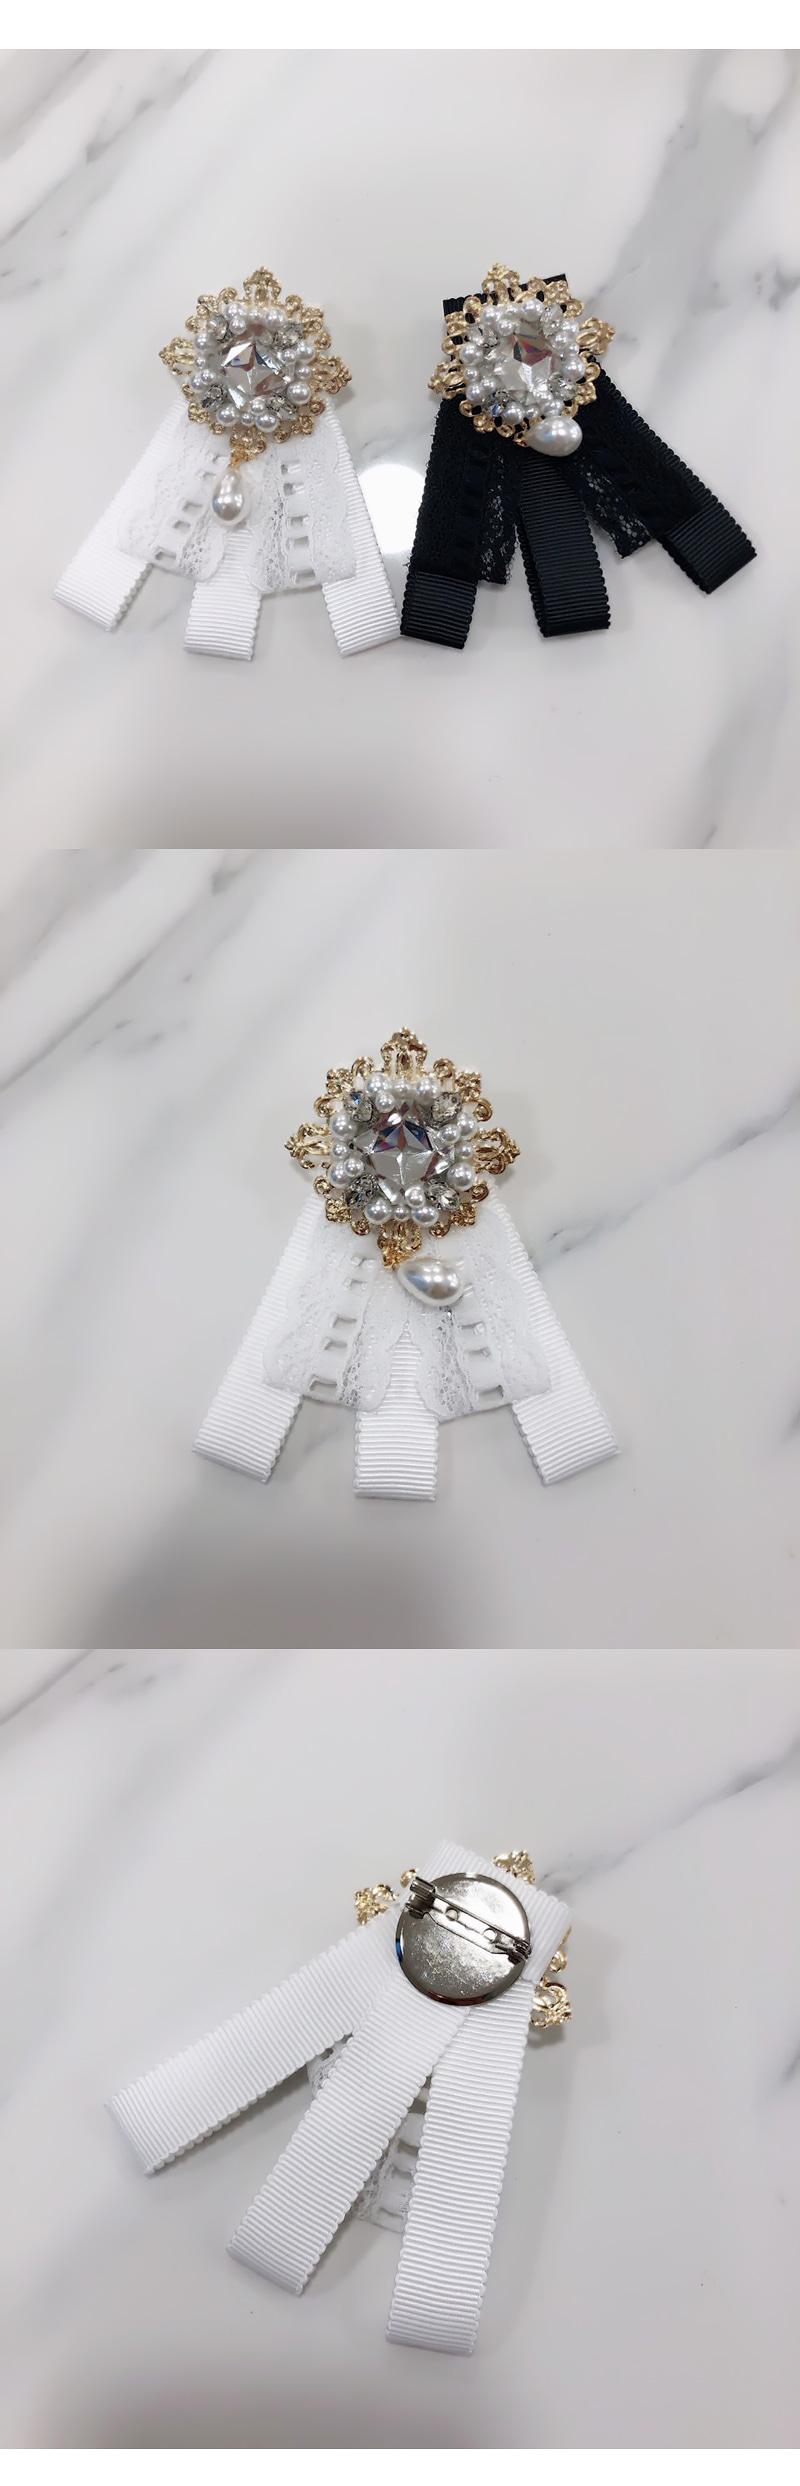 9900 Rosa pearl diamond brooch